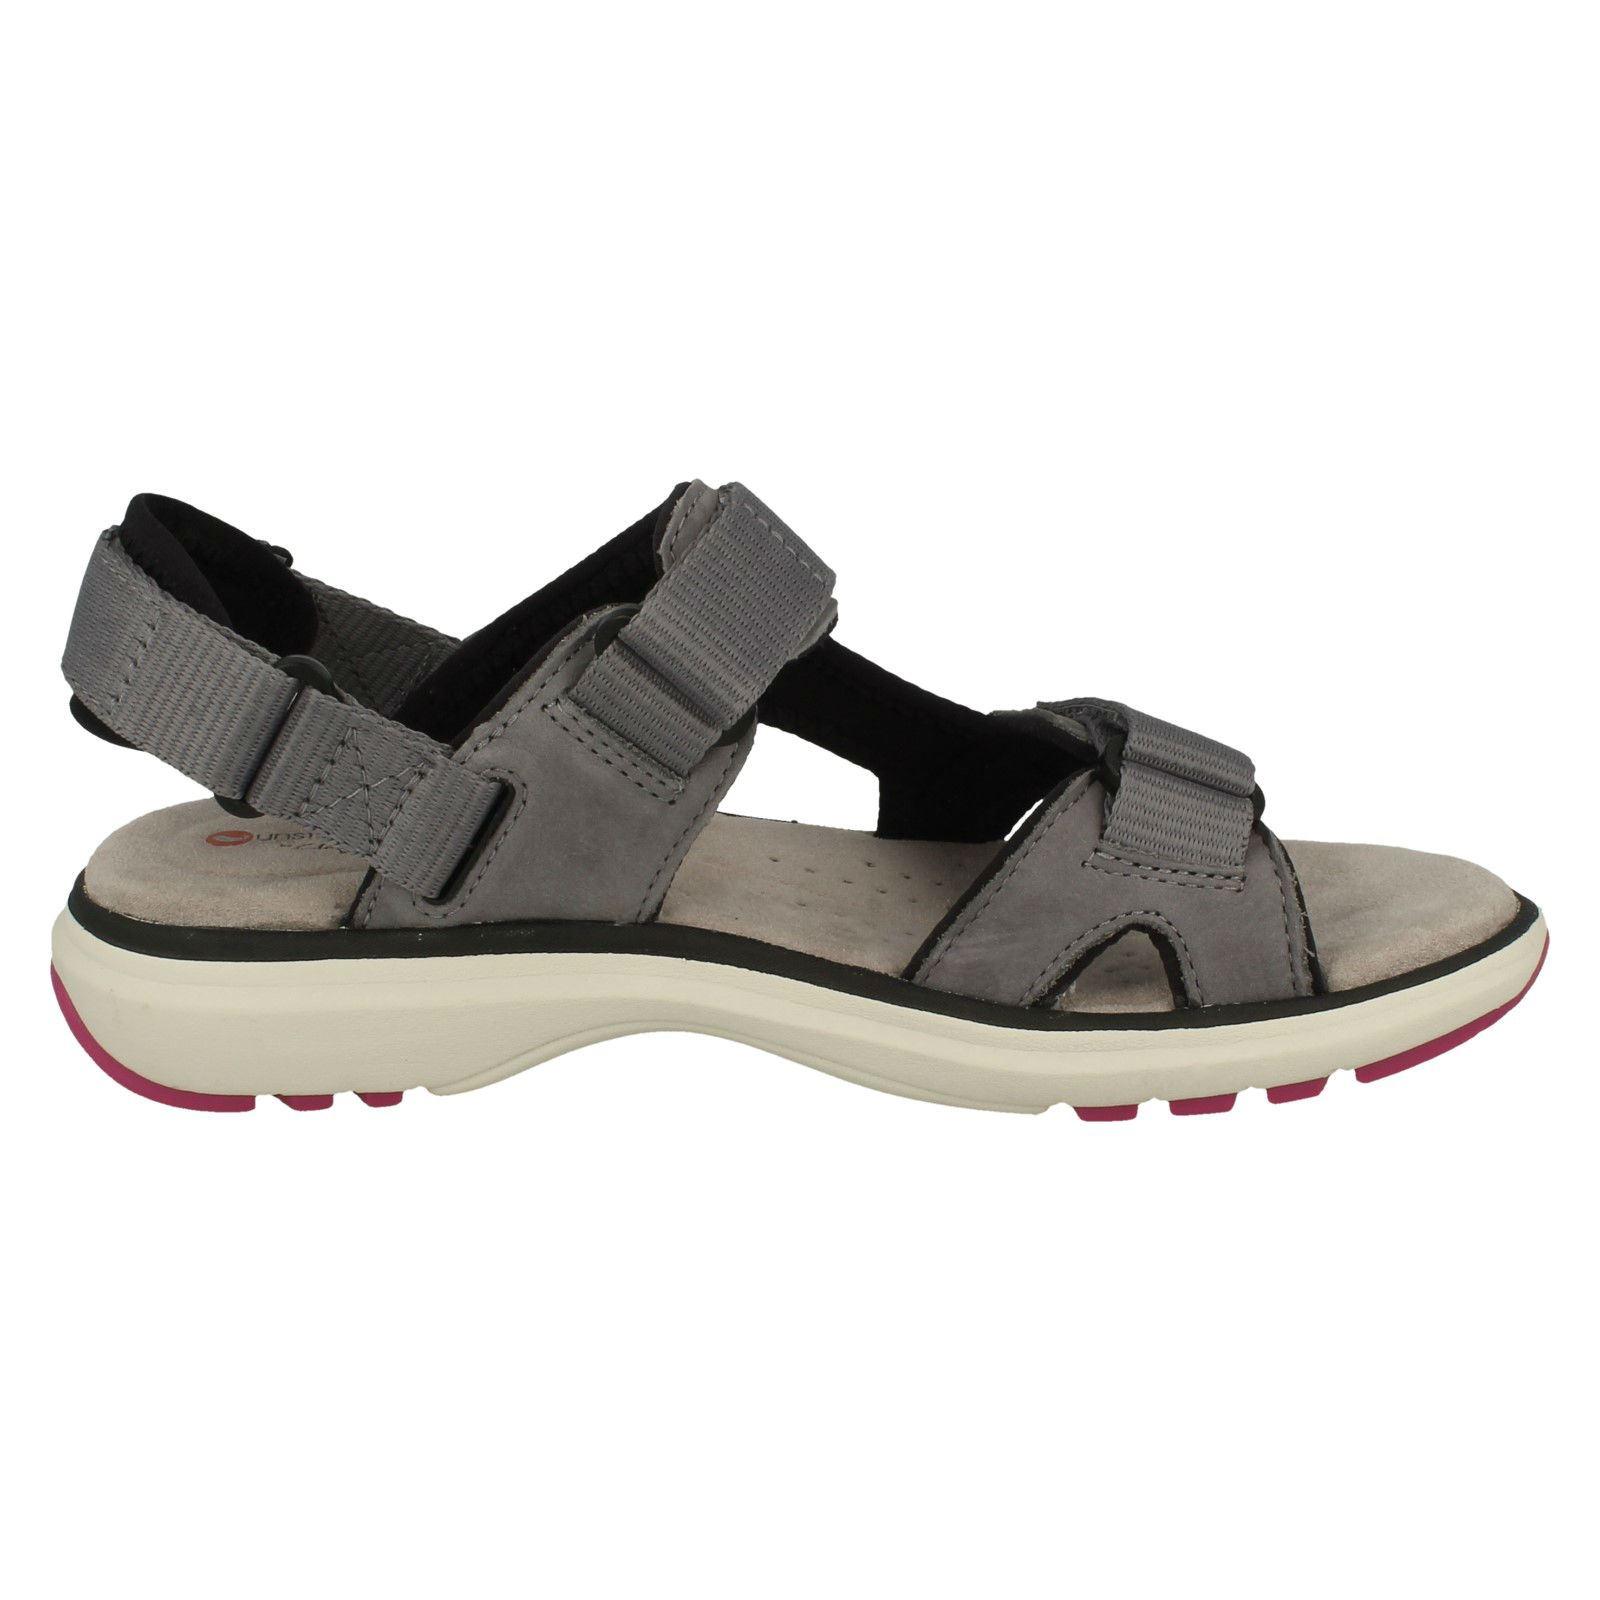 Ladies Clarks Leather Hook and Loop Fastening Sports Sandals /'Un Roam Step/'